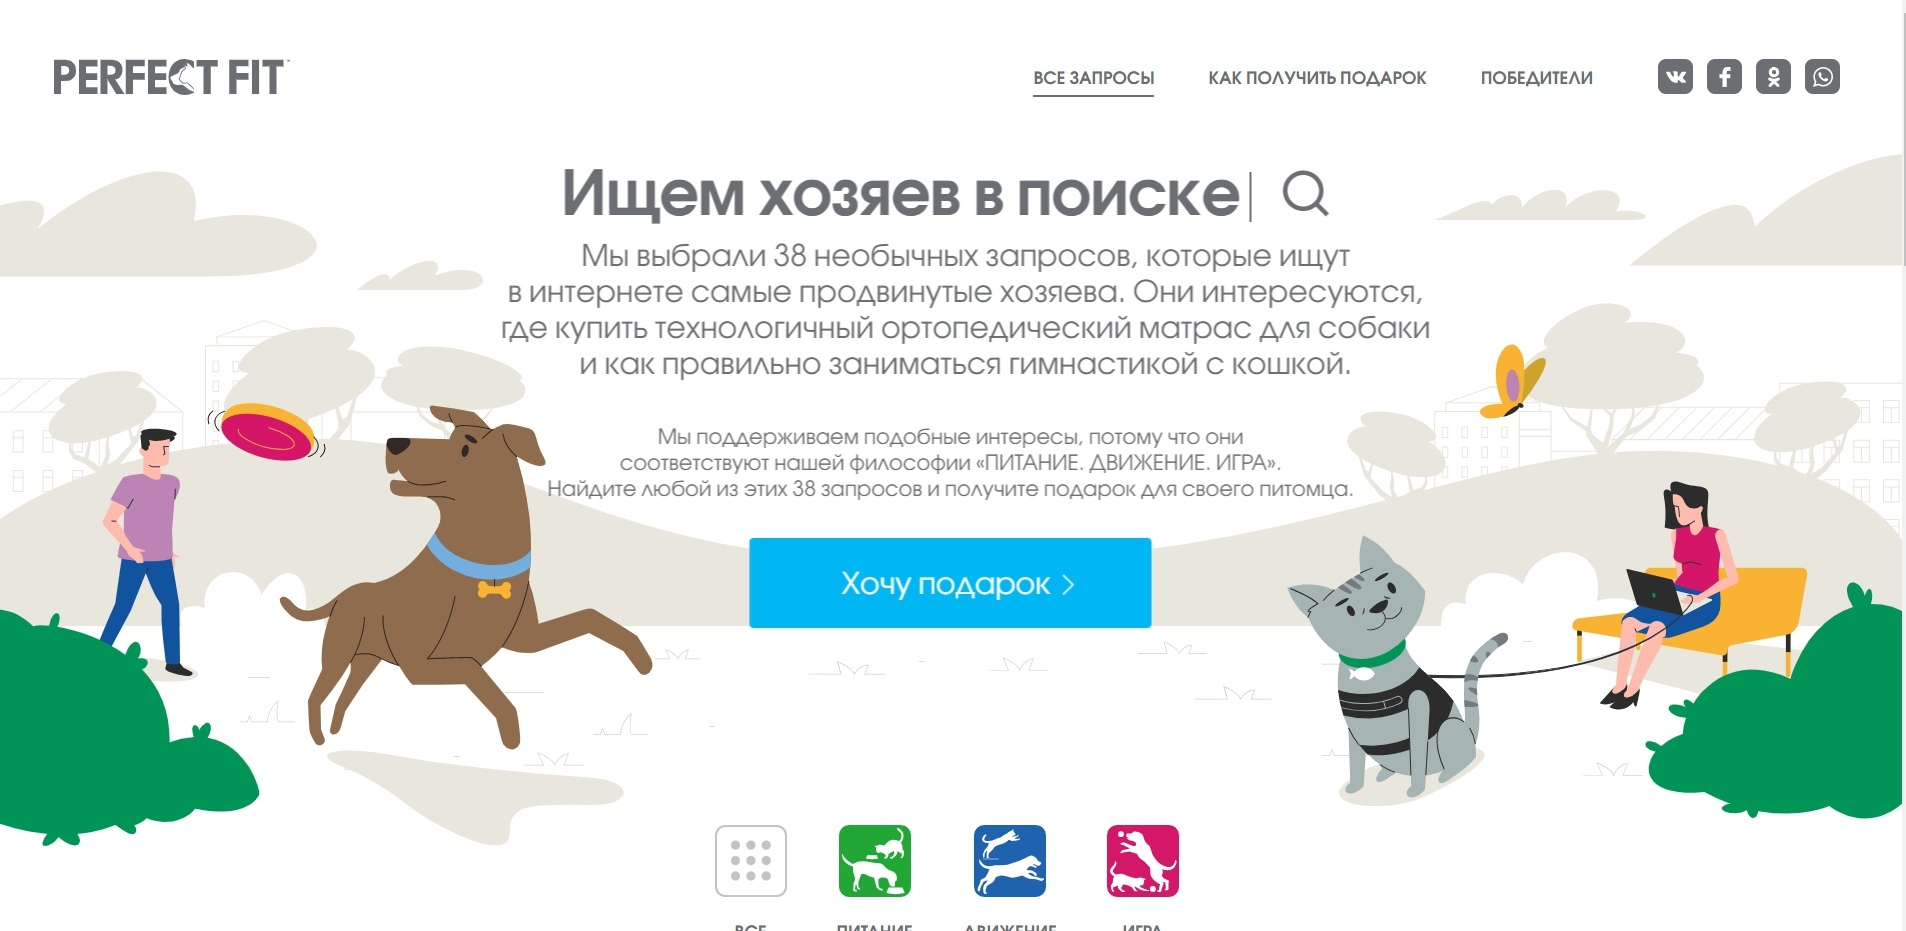 www.search.perfectfit.ru акция 2019 года